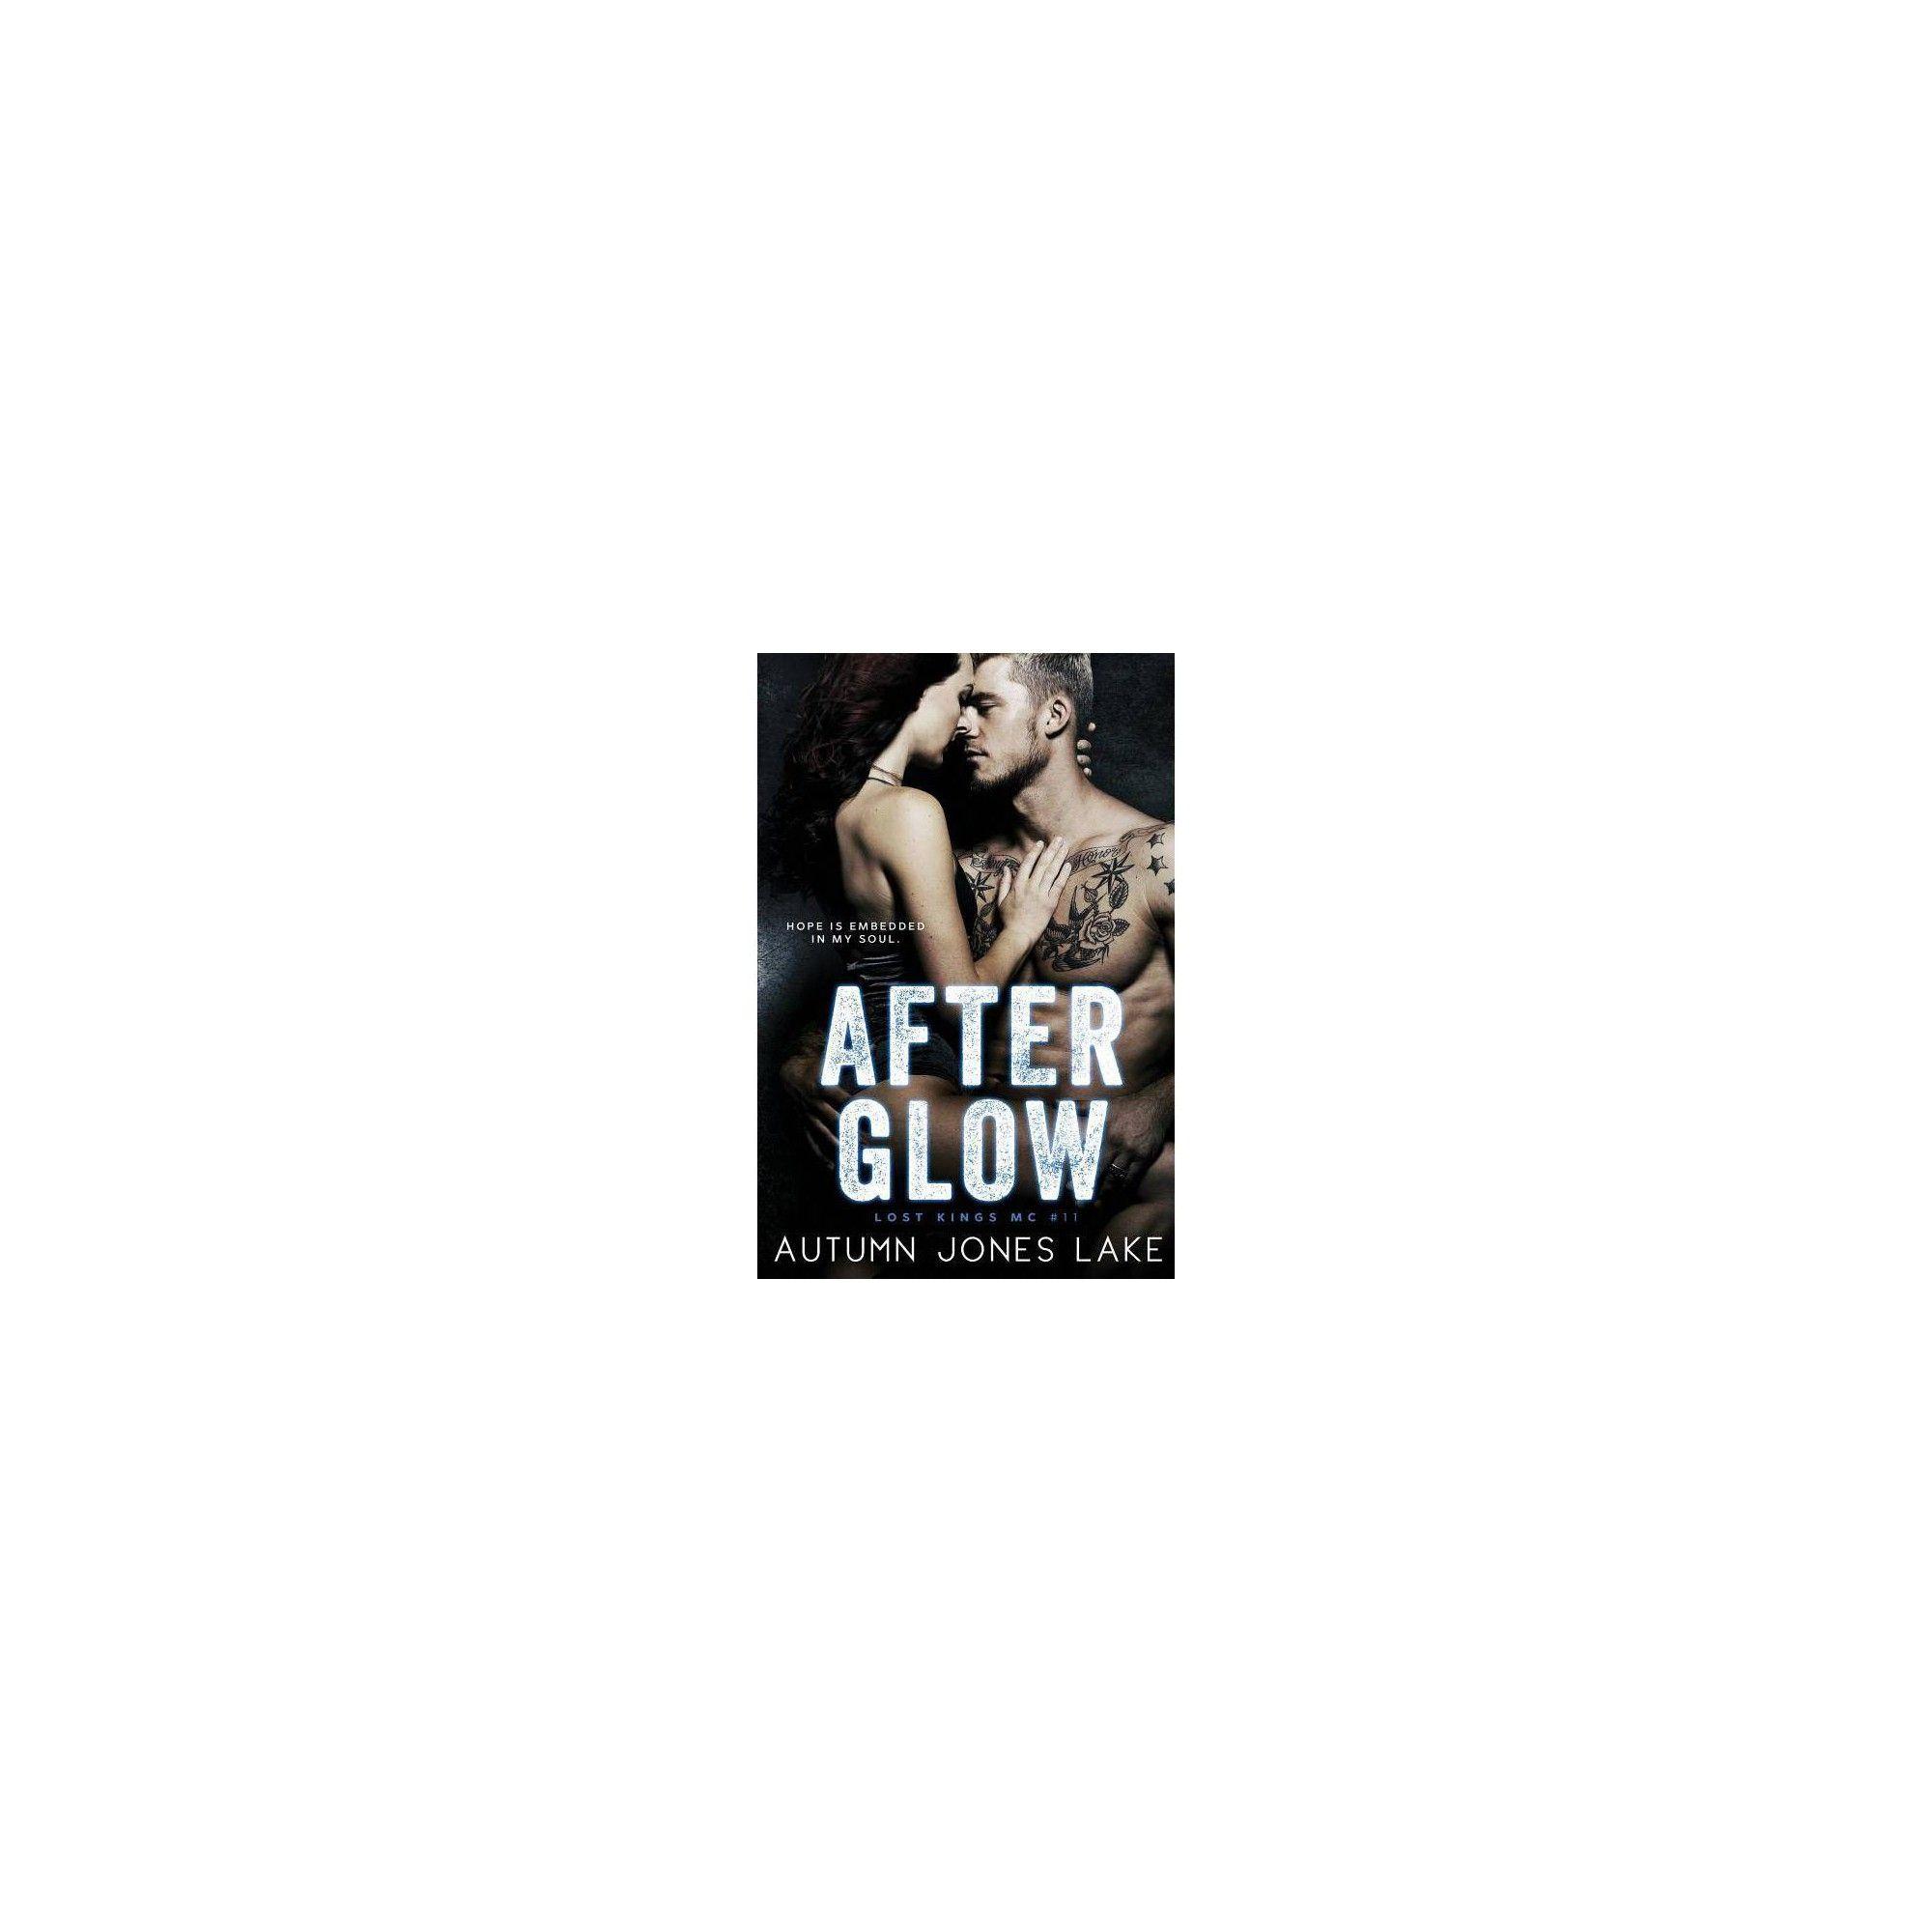 After Glow (Lost Kings MC #11) - by Autumn Jones Lake (Paperback)